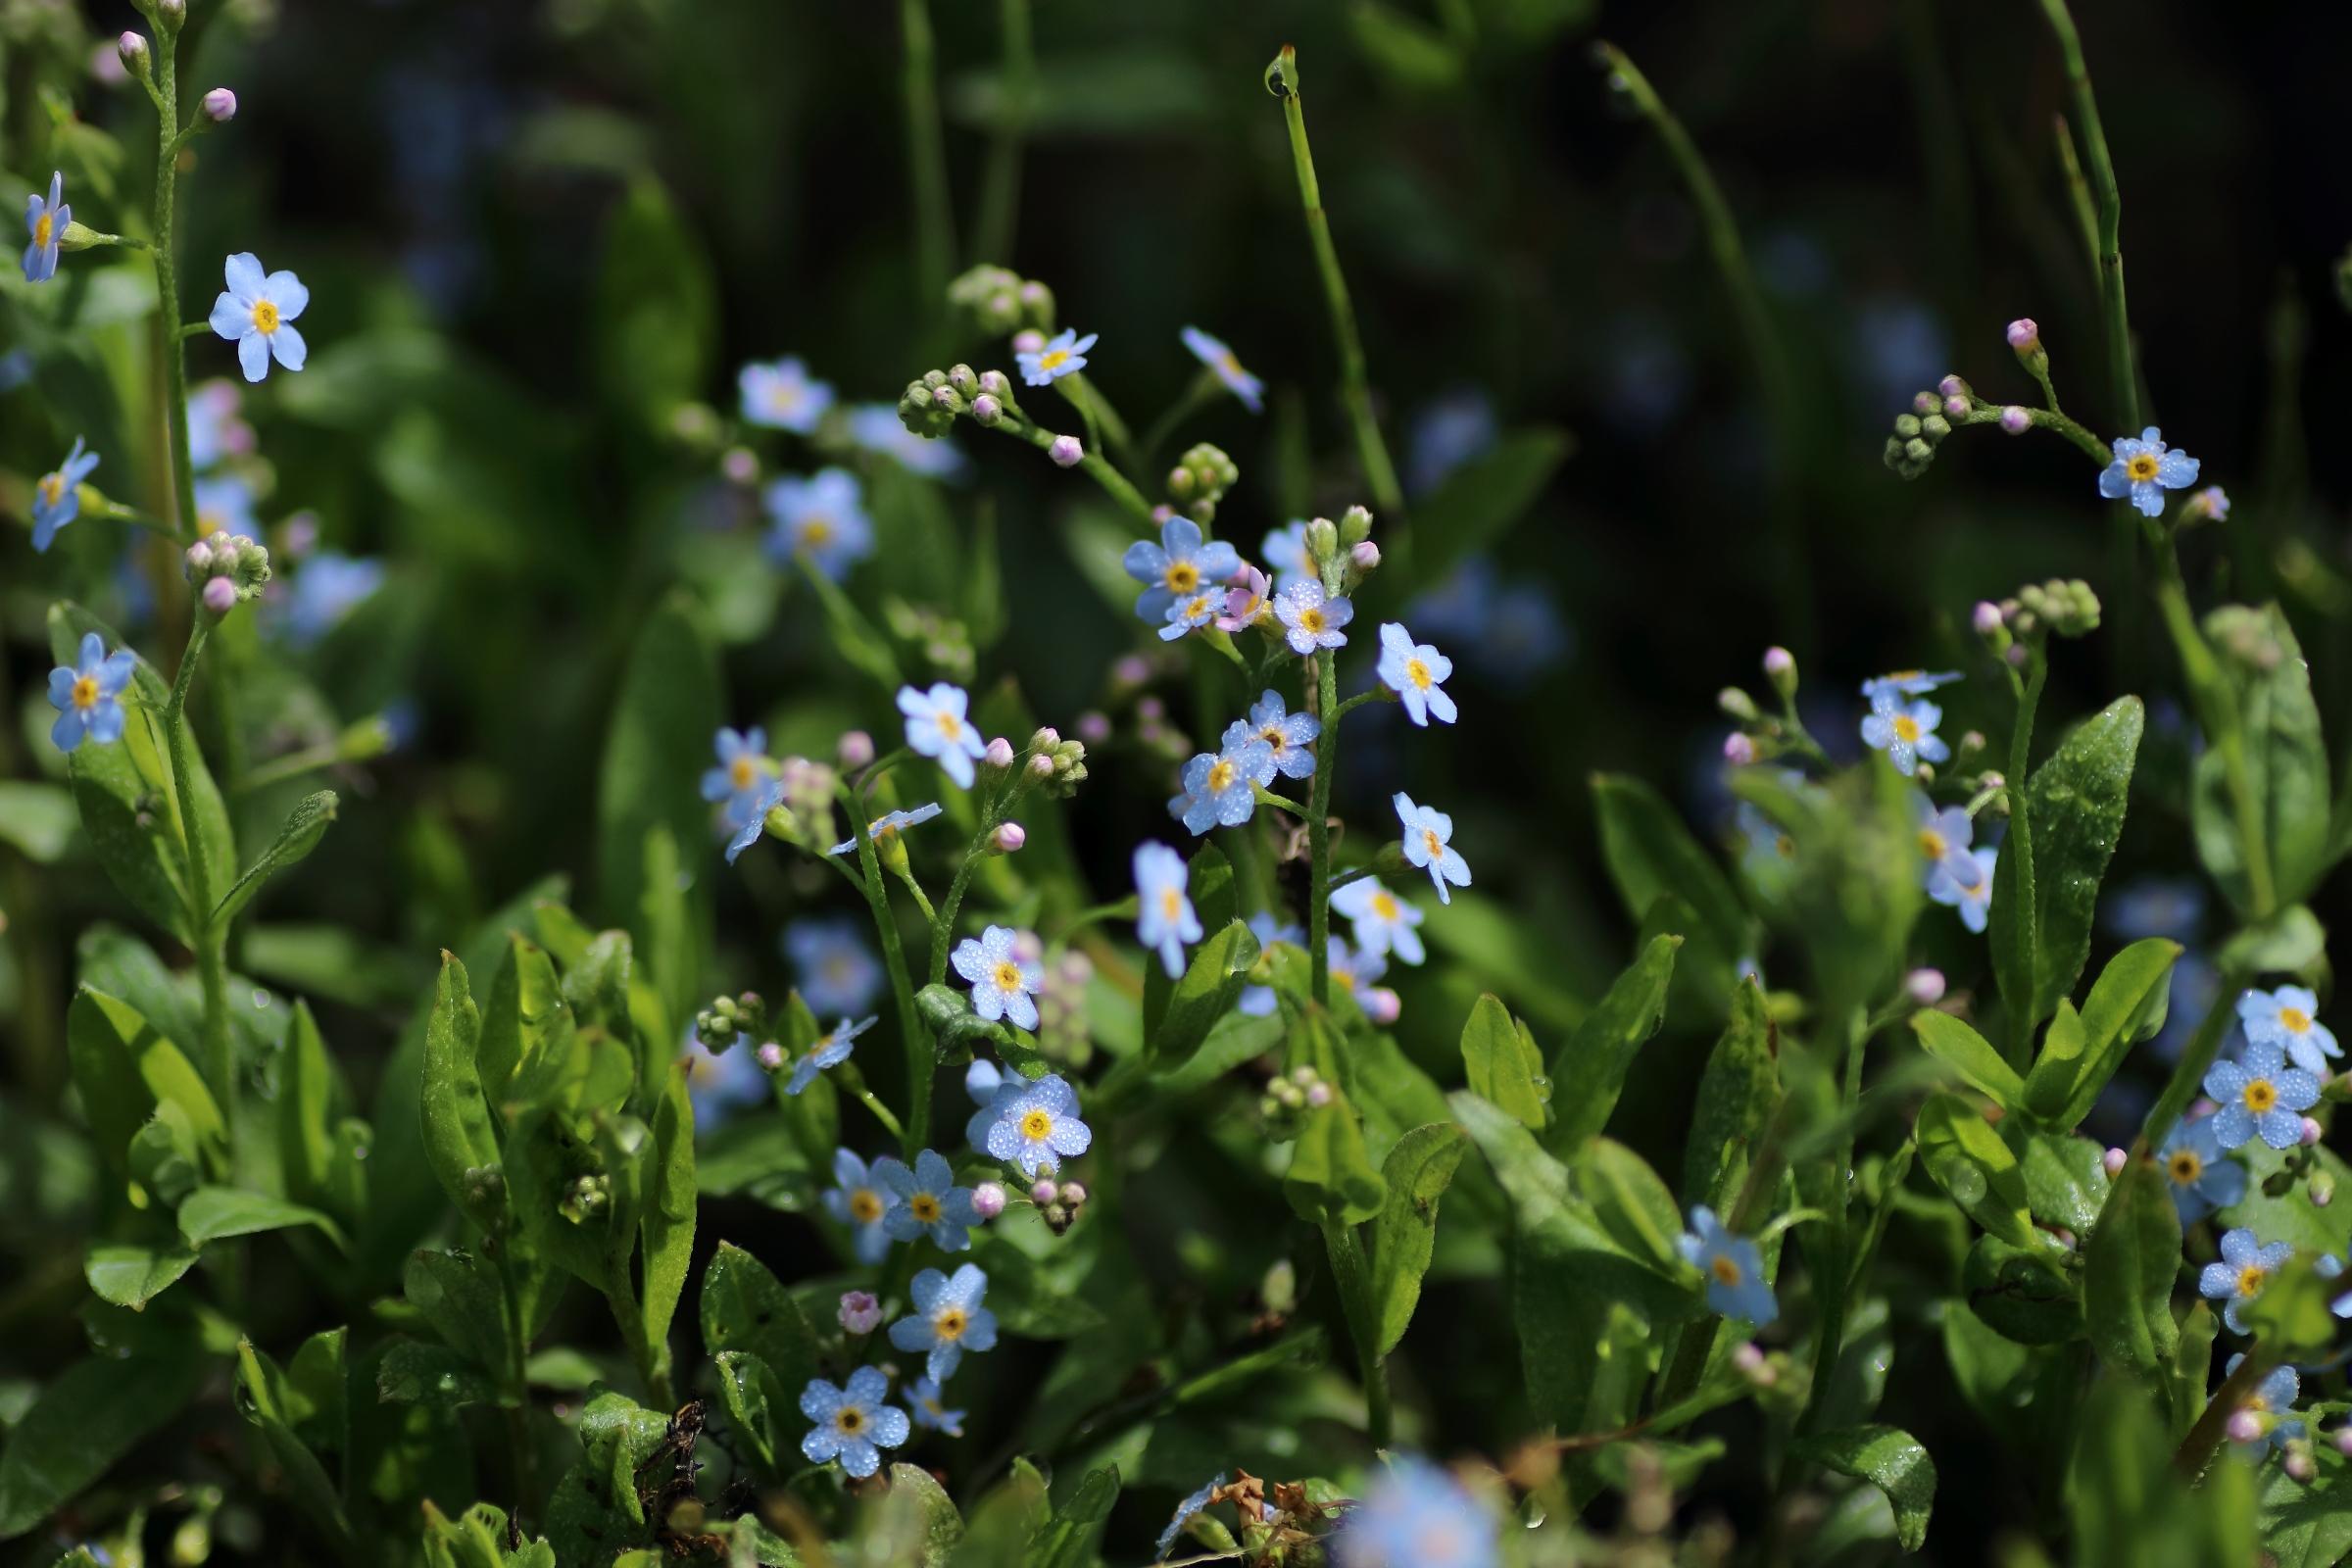 Sumpf-Vergissmeinnicht - Blüten